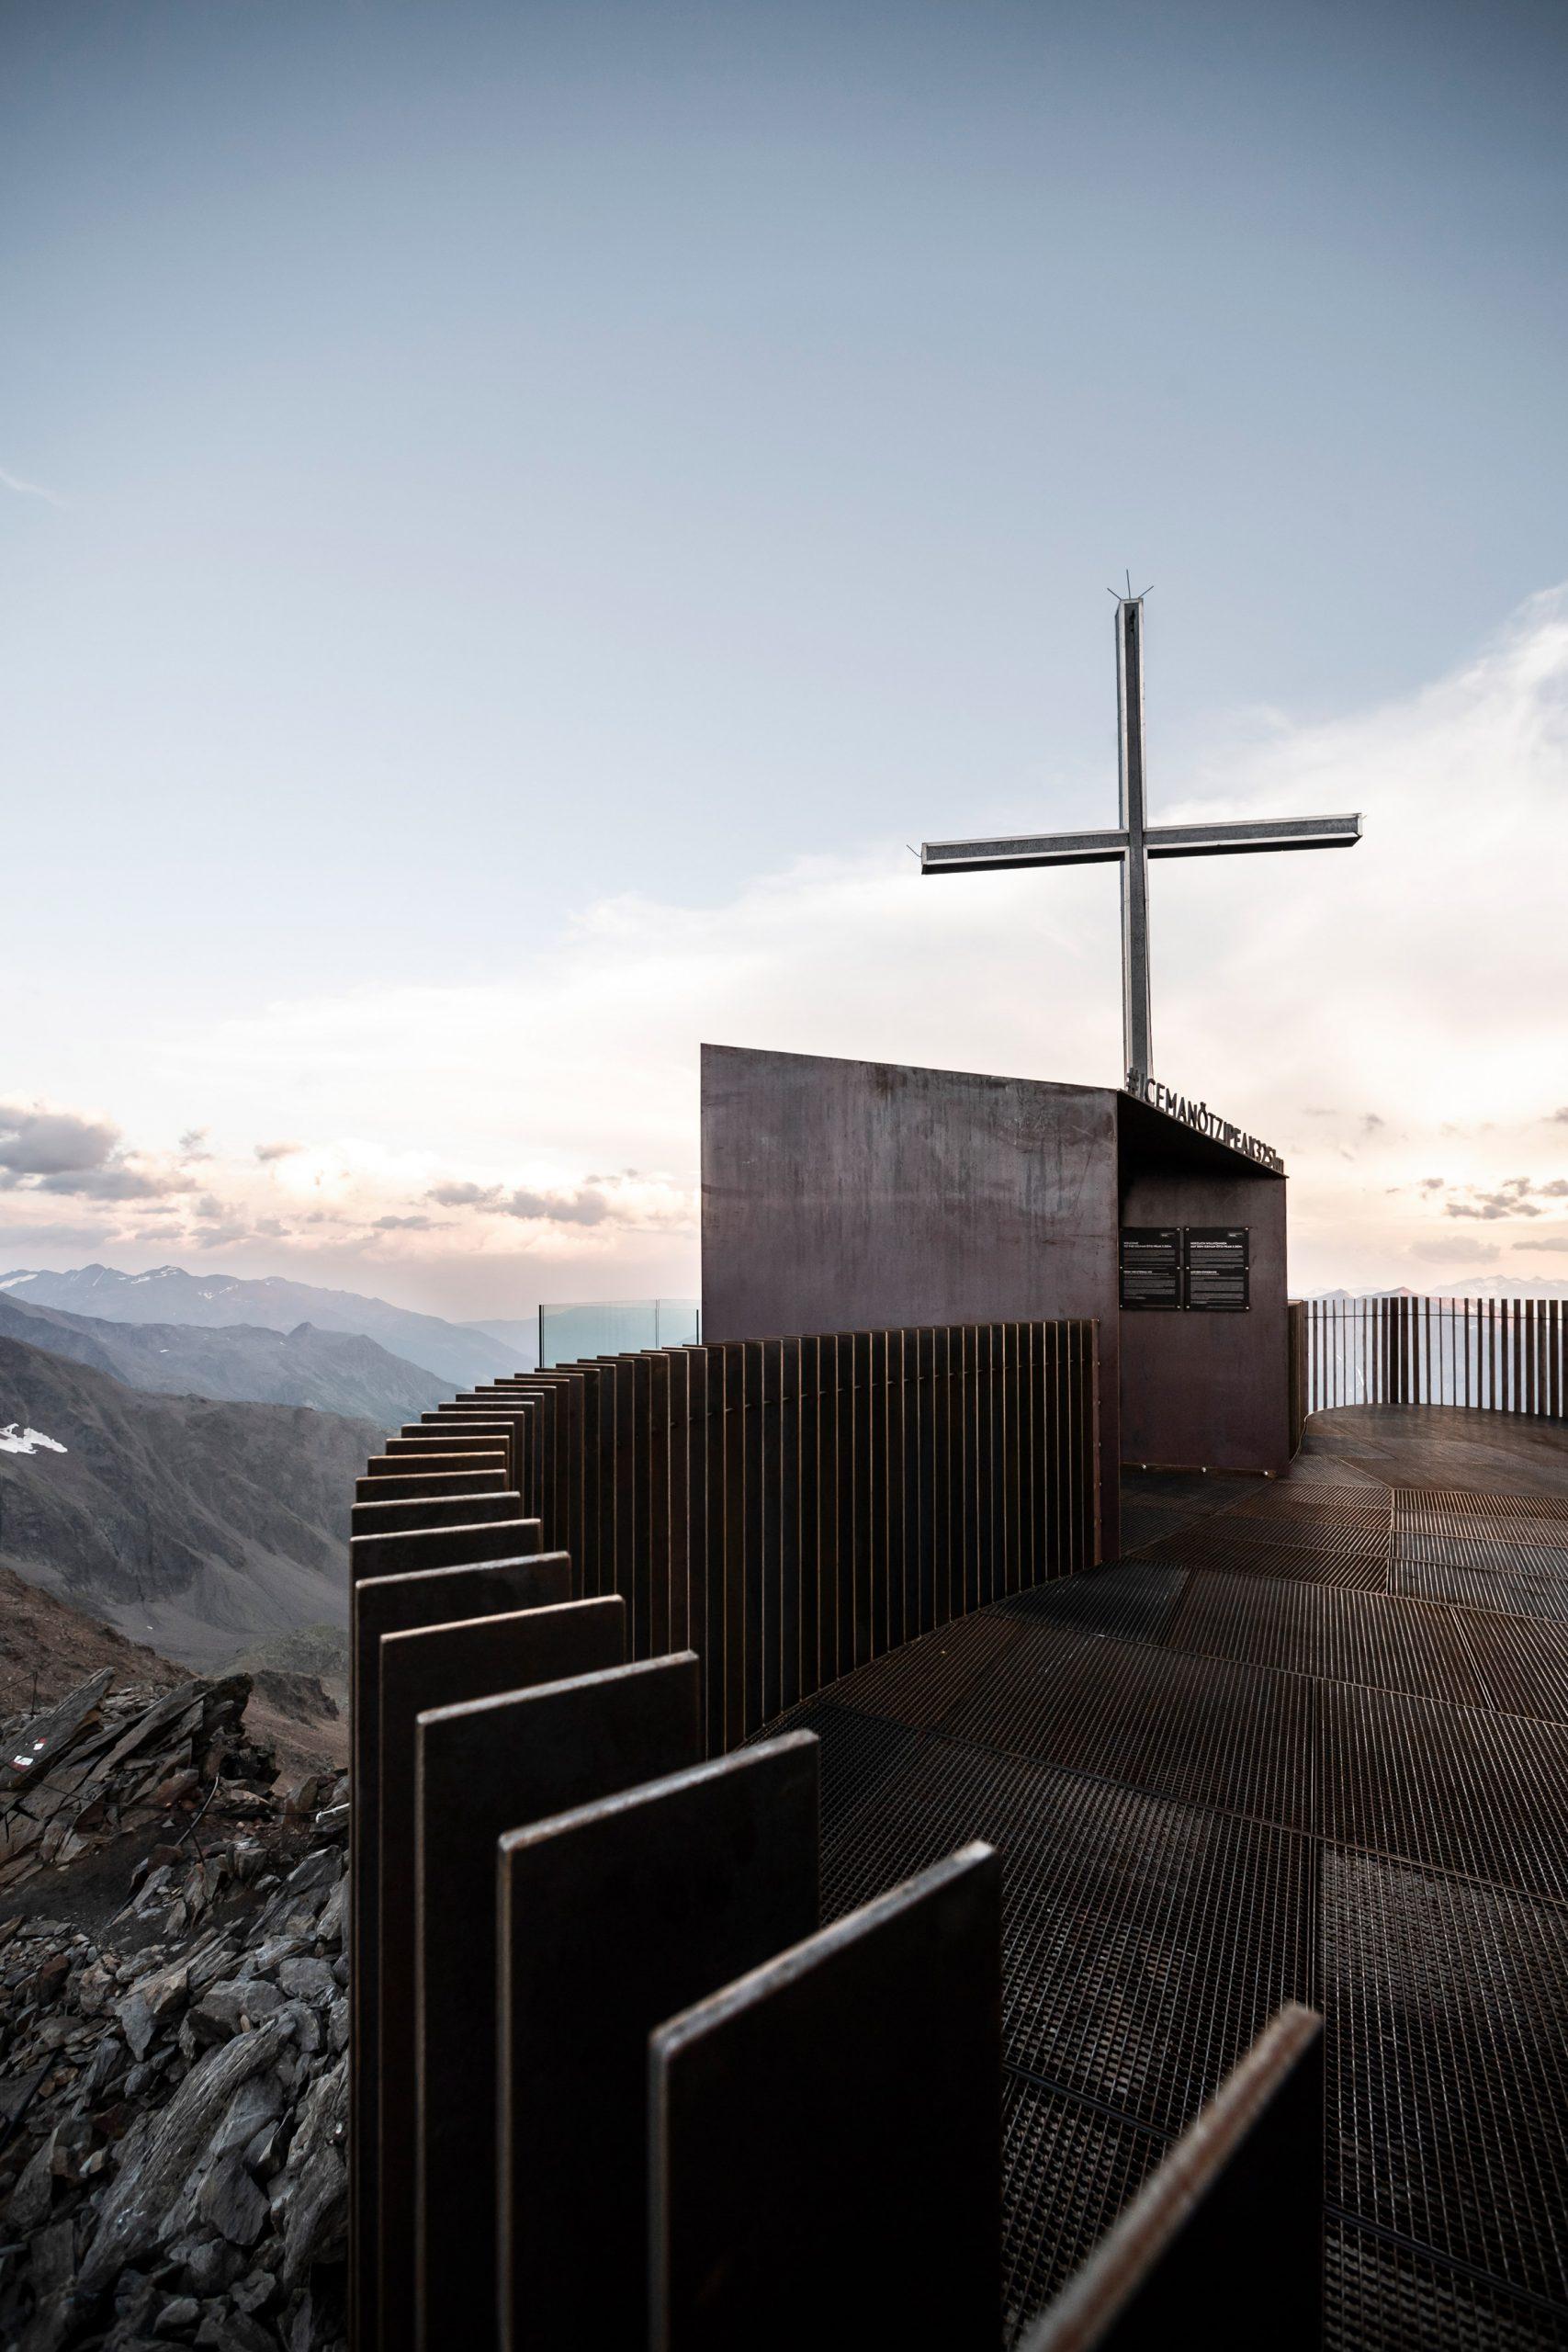 Summit cross of Otzi Peak 3251m viewpoint by Netowrk of Architecture in South Tyrol